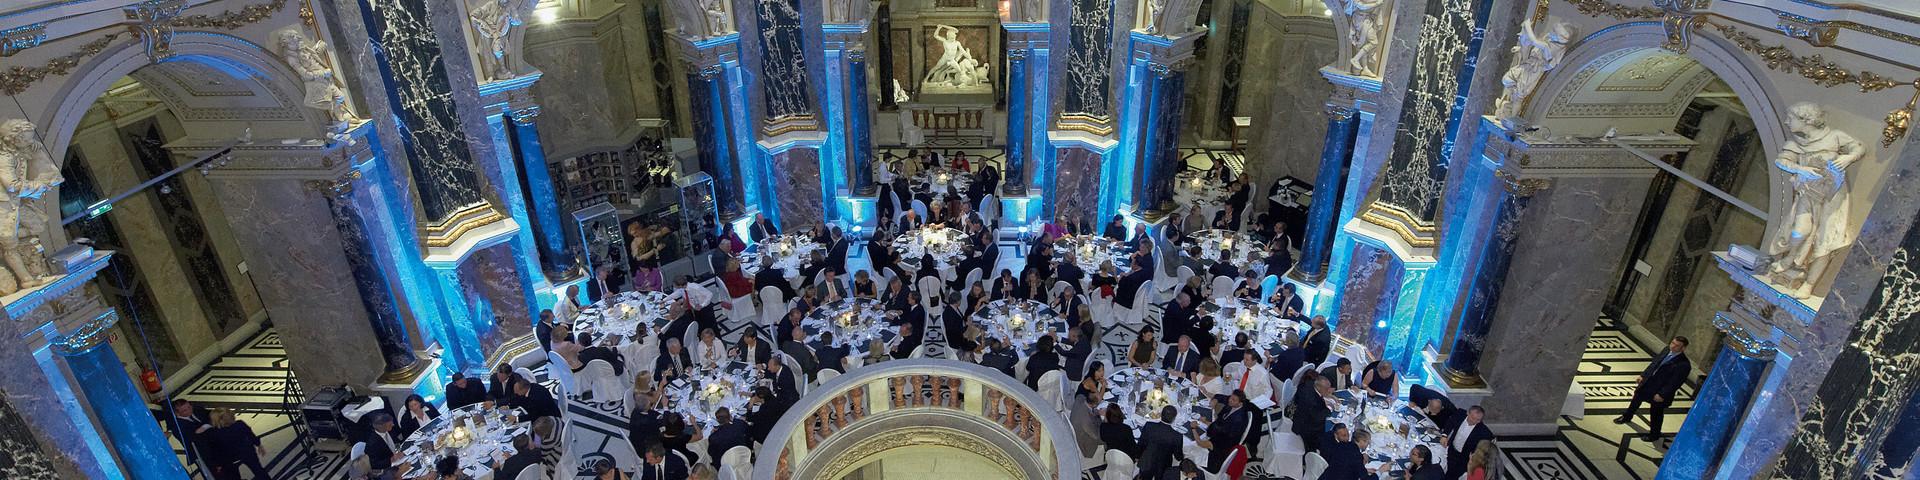 Kunsthistorisches Museum Wien - Bankett Kuppelhalle blau © KHM-Museumsverband, 2017